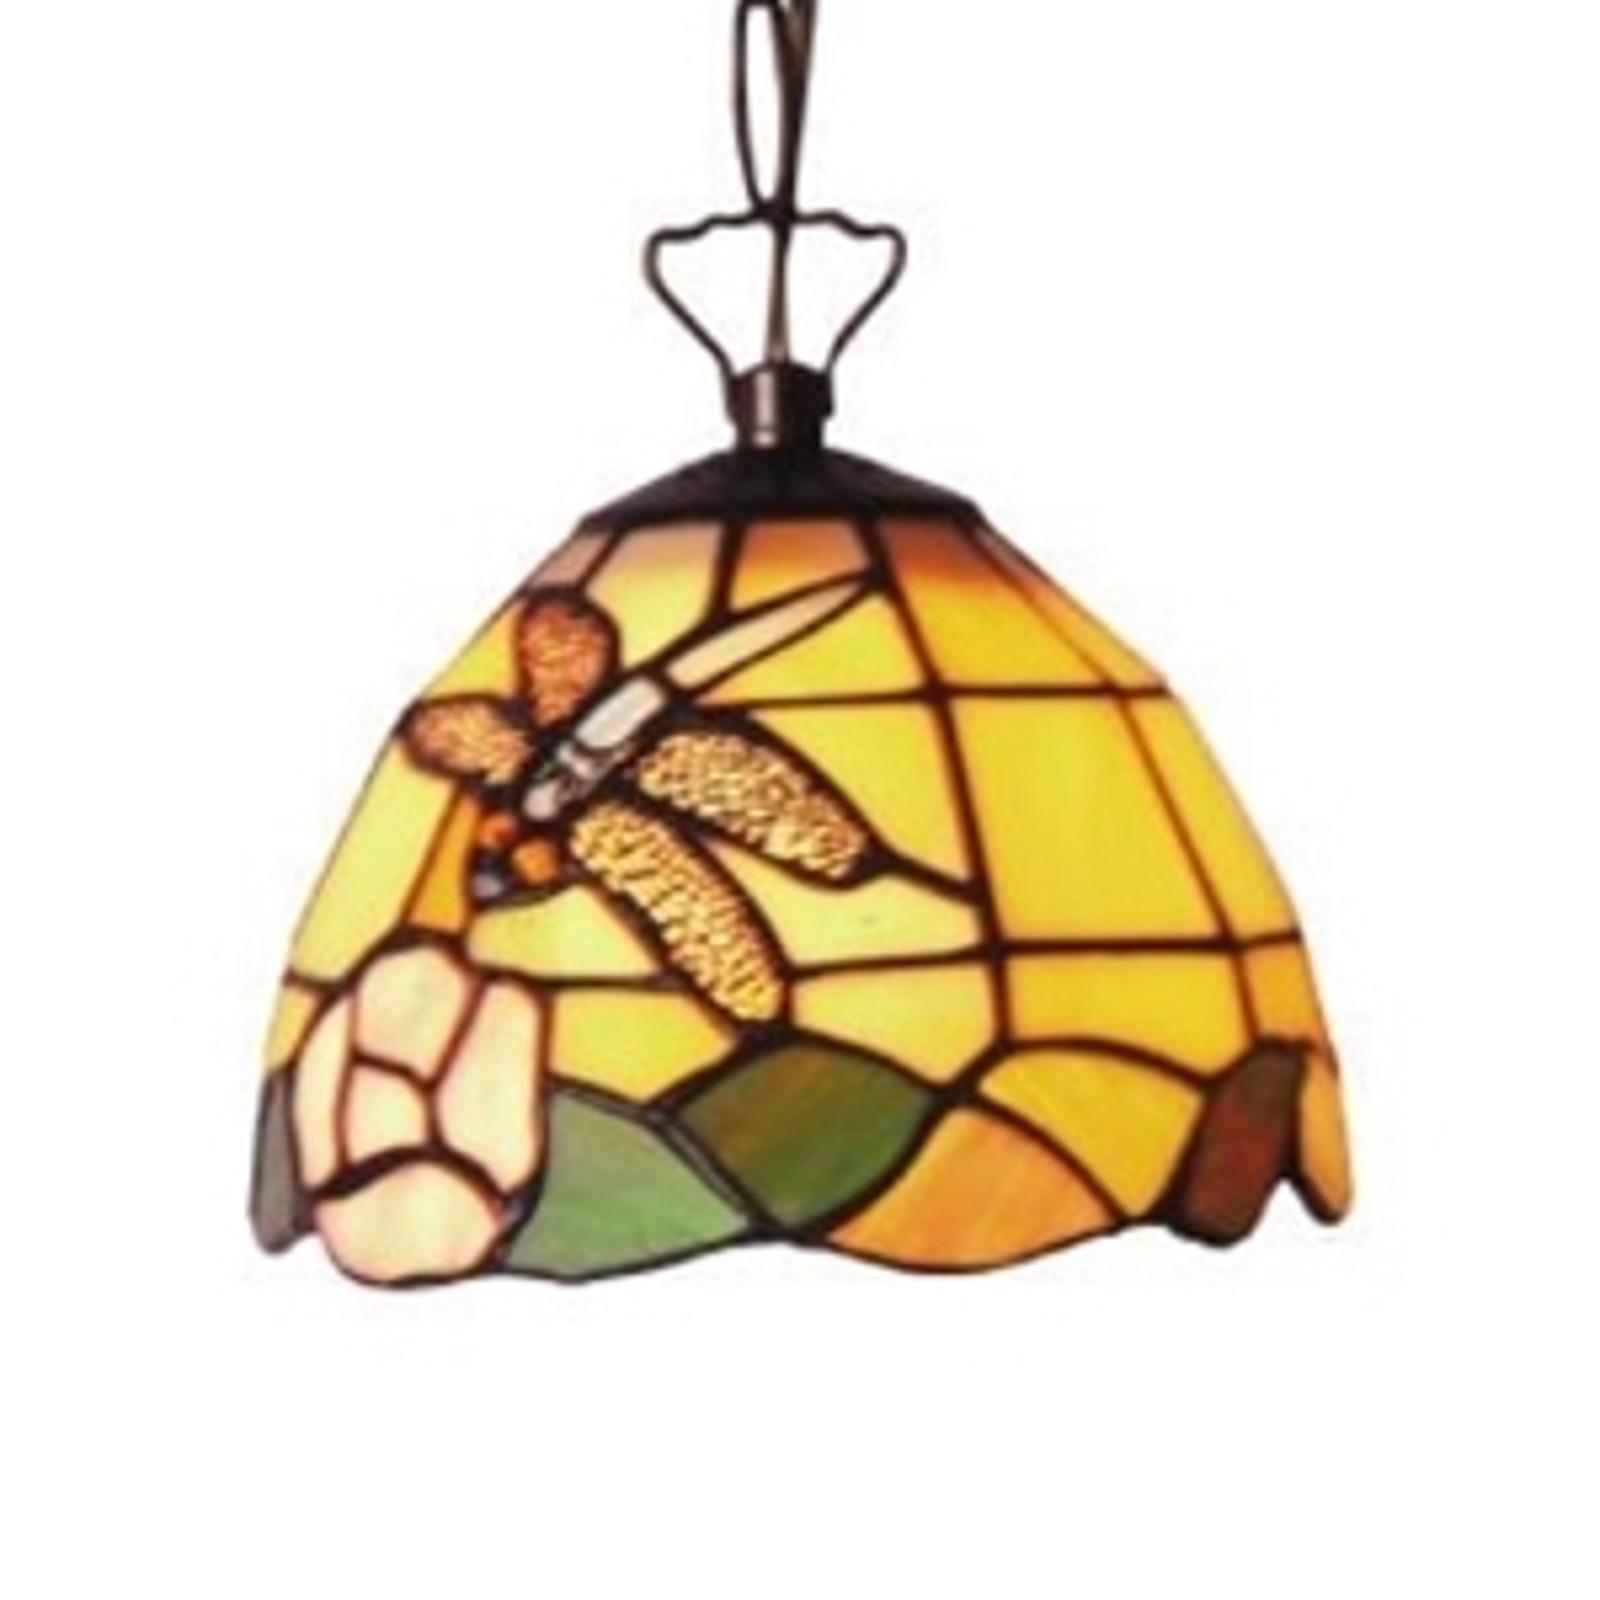 Fleurige hanglamp LIBELLE in Tiffany-stijl